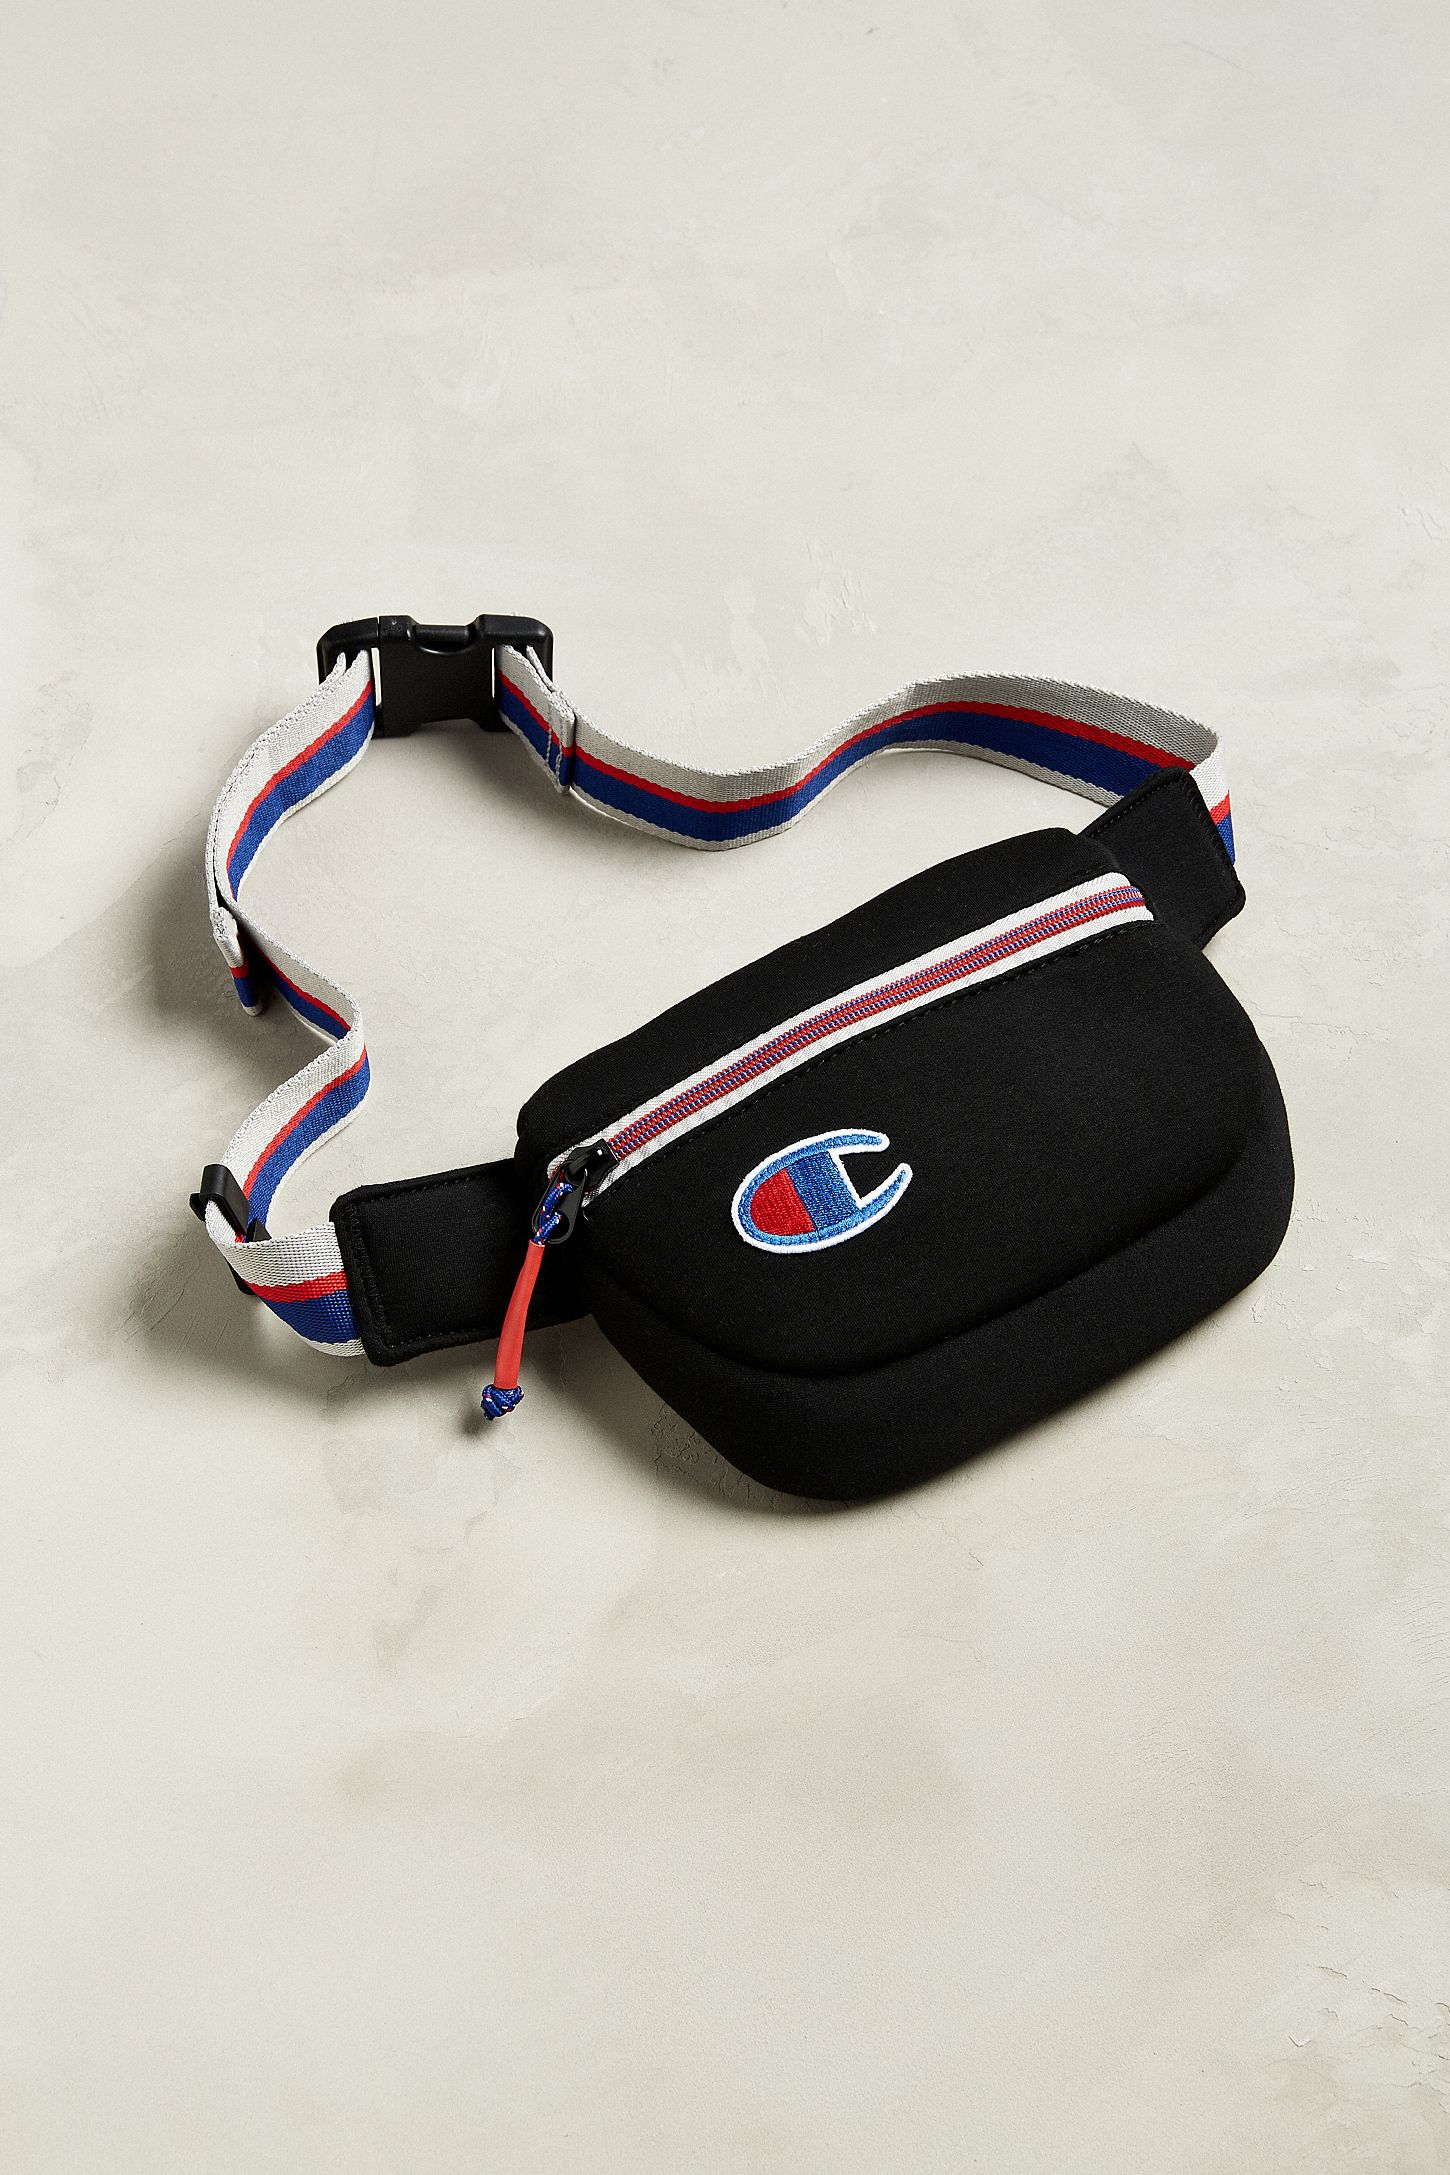 6d3080473a8d Champion Attribute Sling Bag